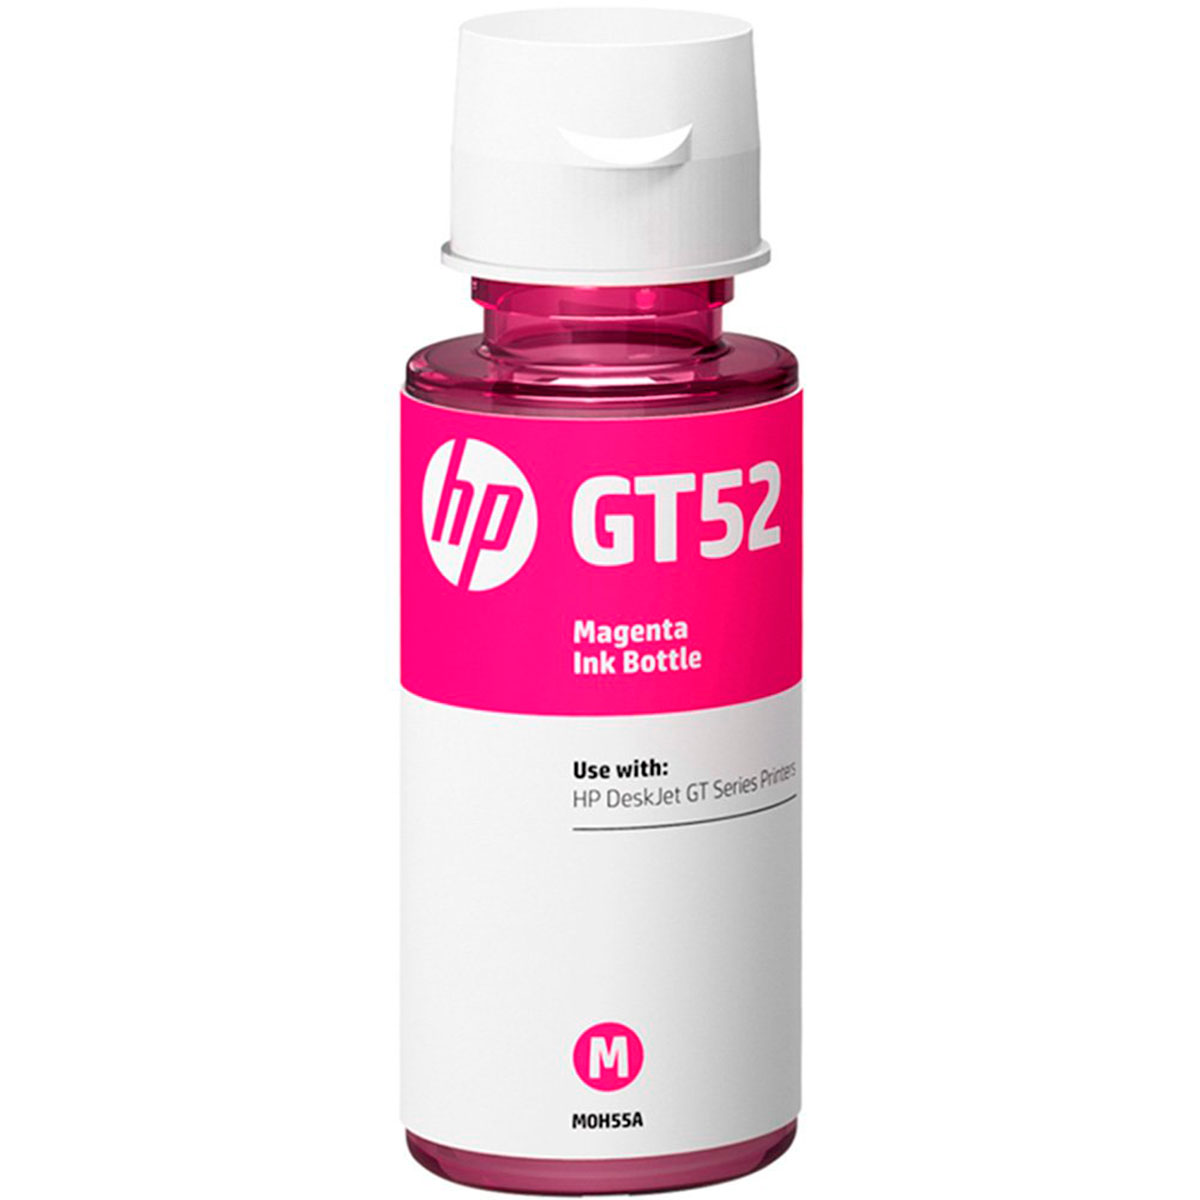 Refil de Tinta HP GT52, Magenta, 70ml, Para Impressora HP Deskjet GT 5822 - M0H55AL